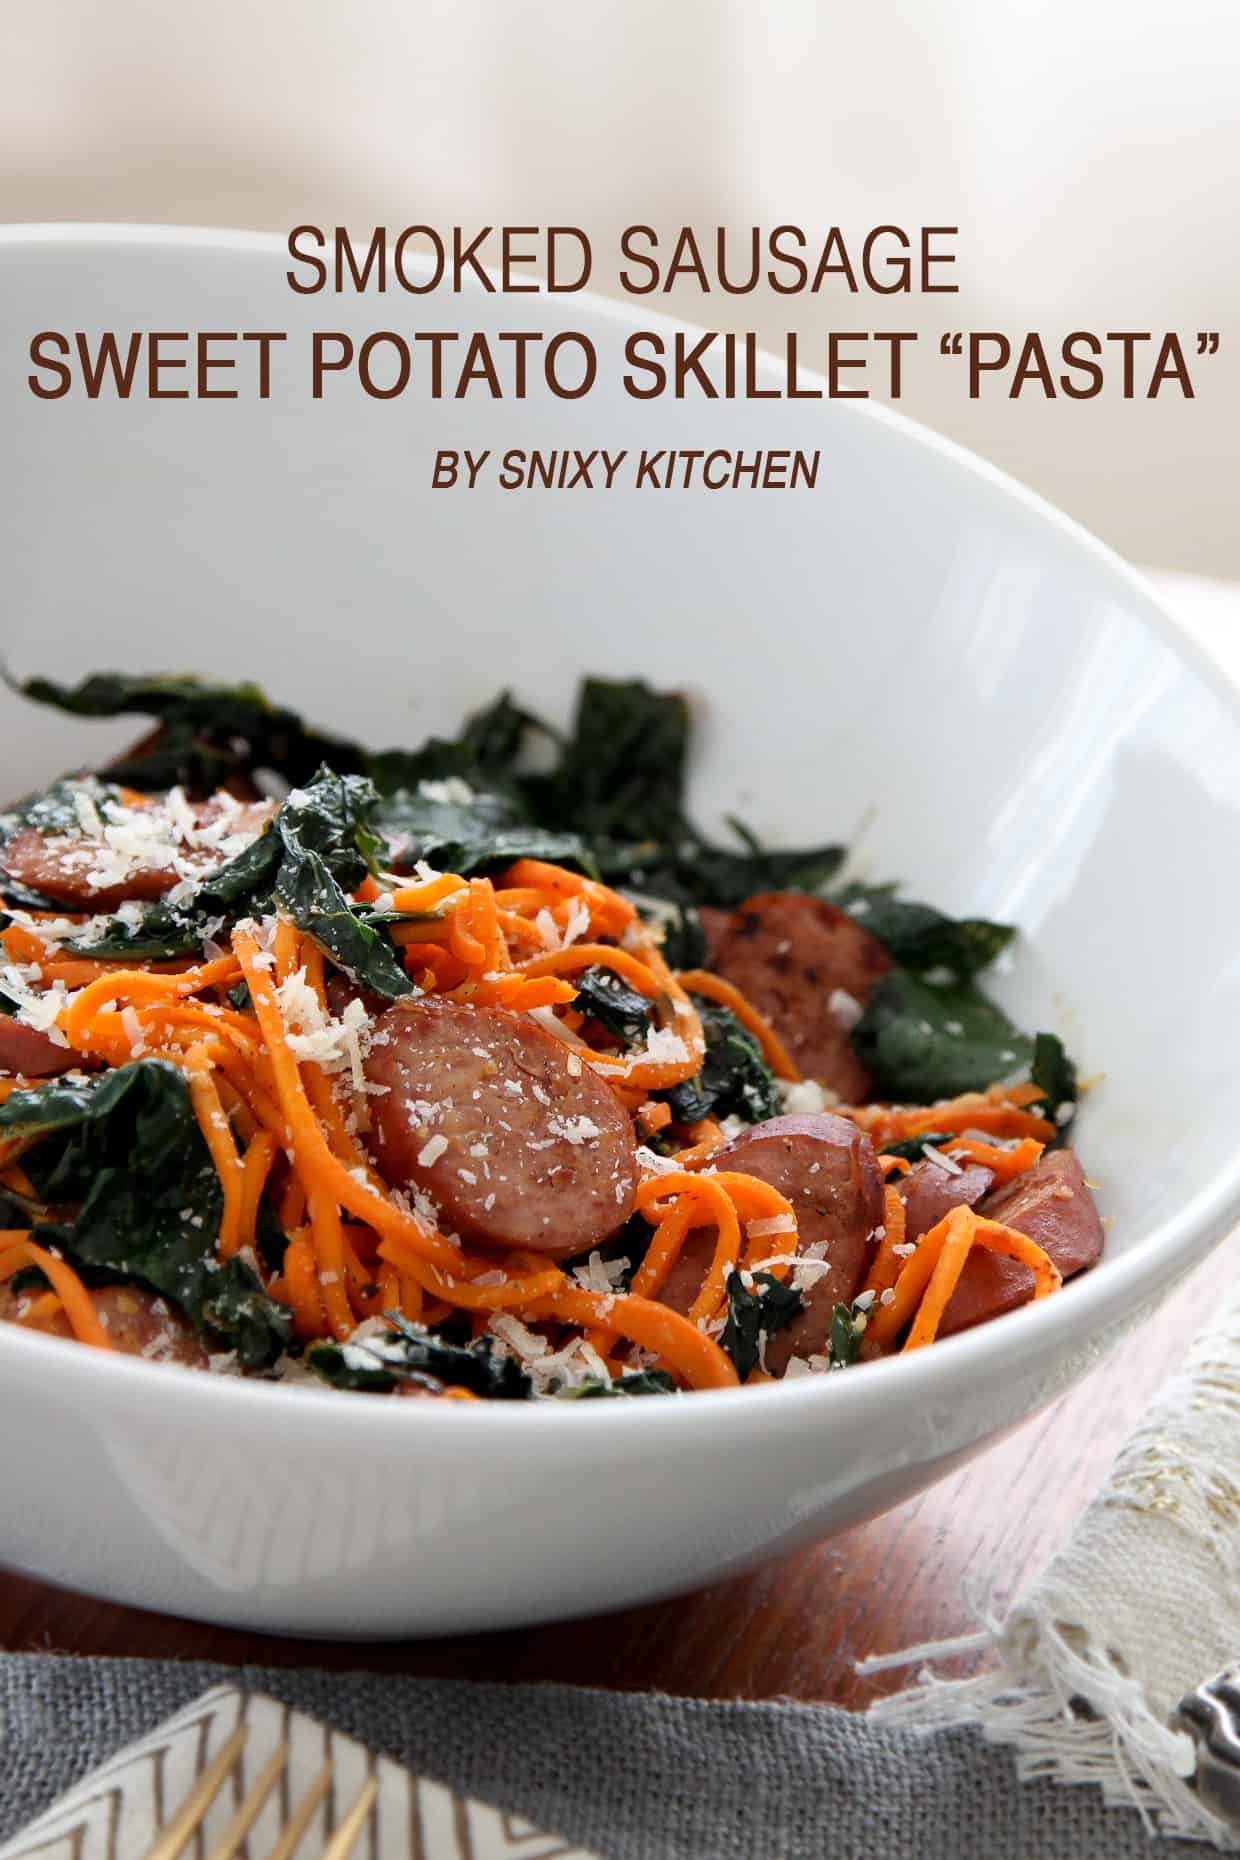 Sweet Potato Skillet Pasta